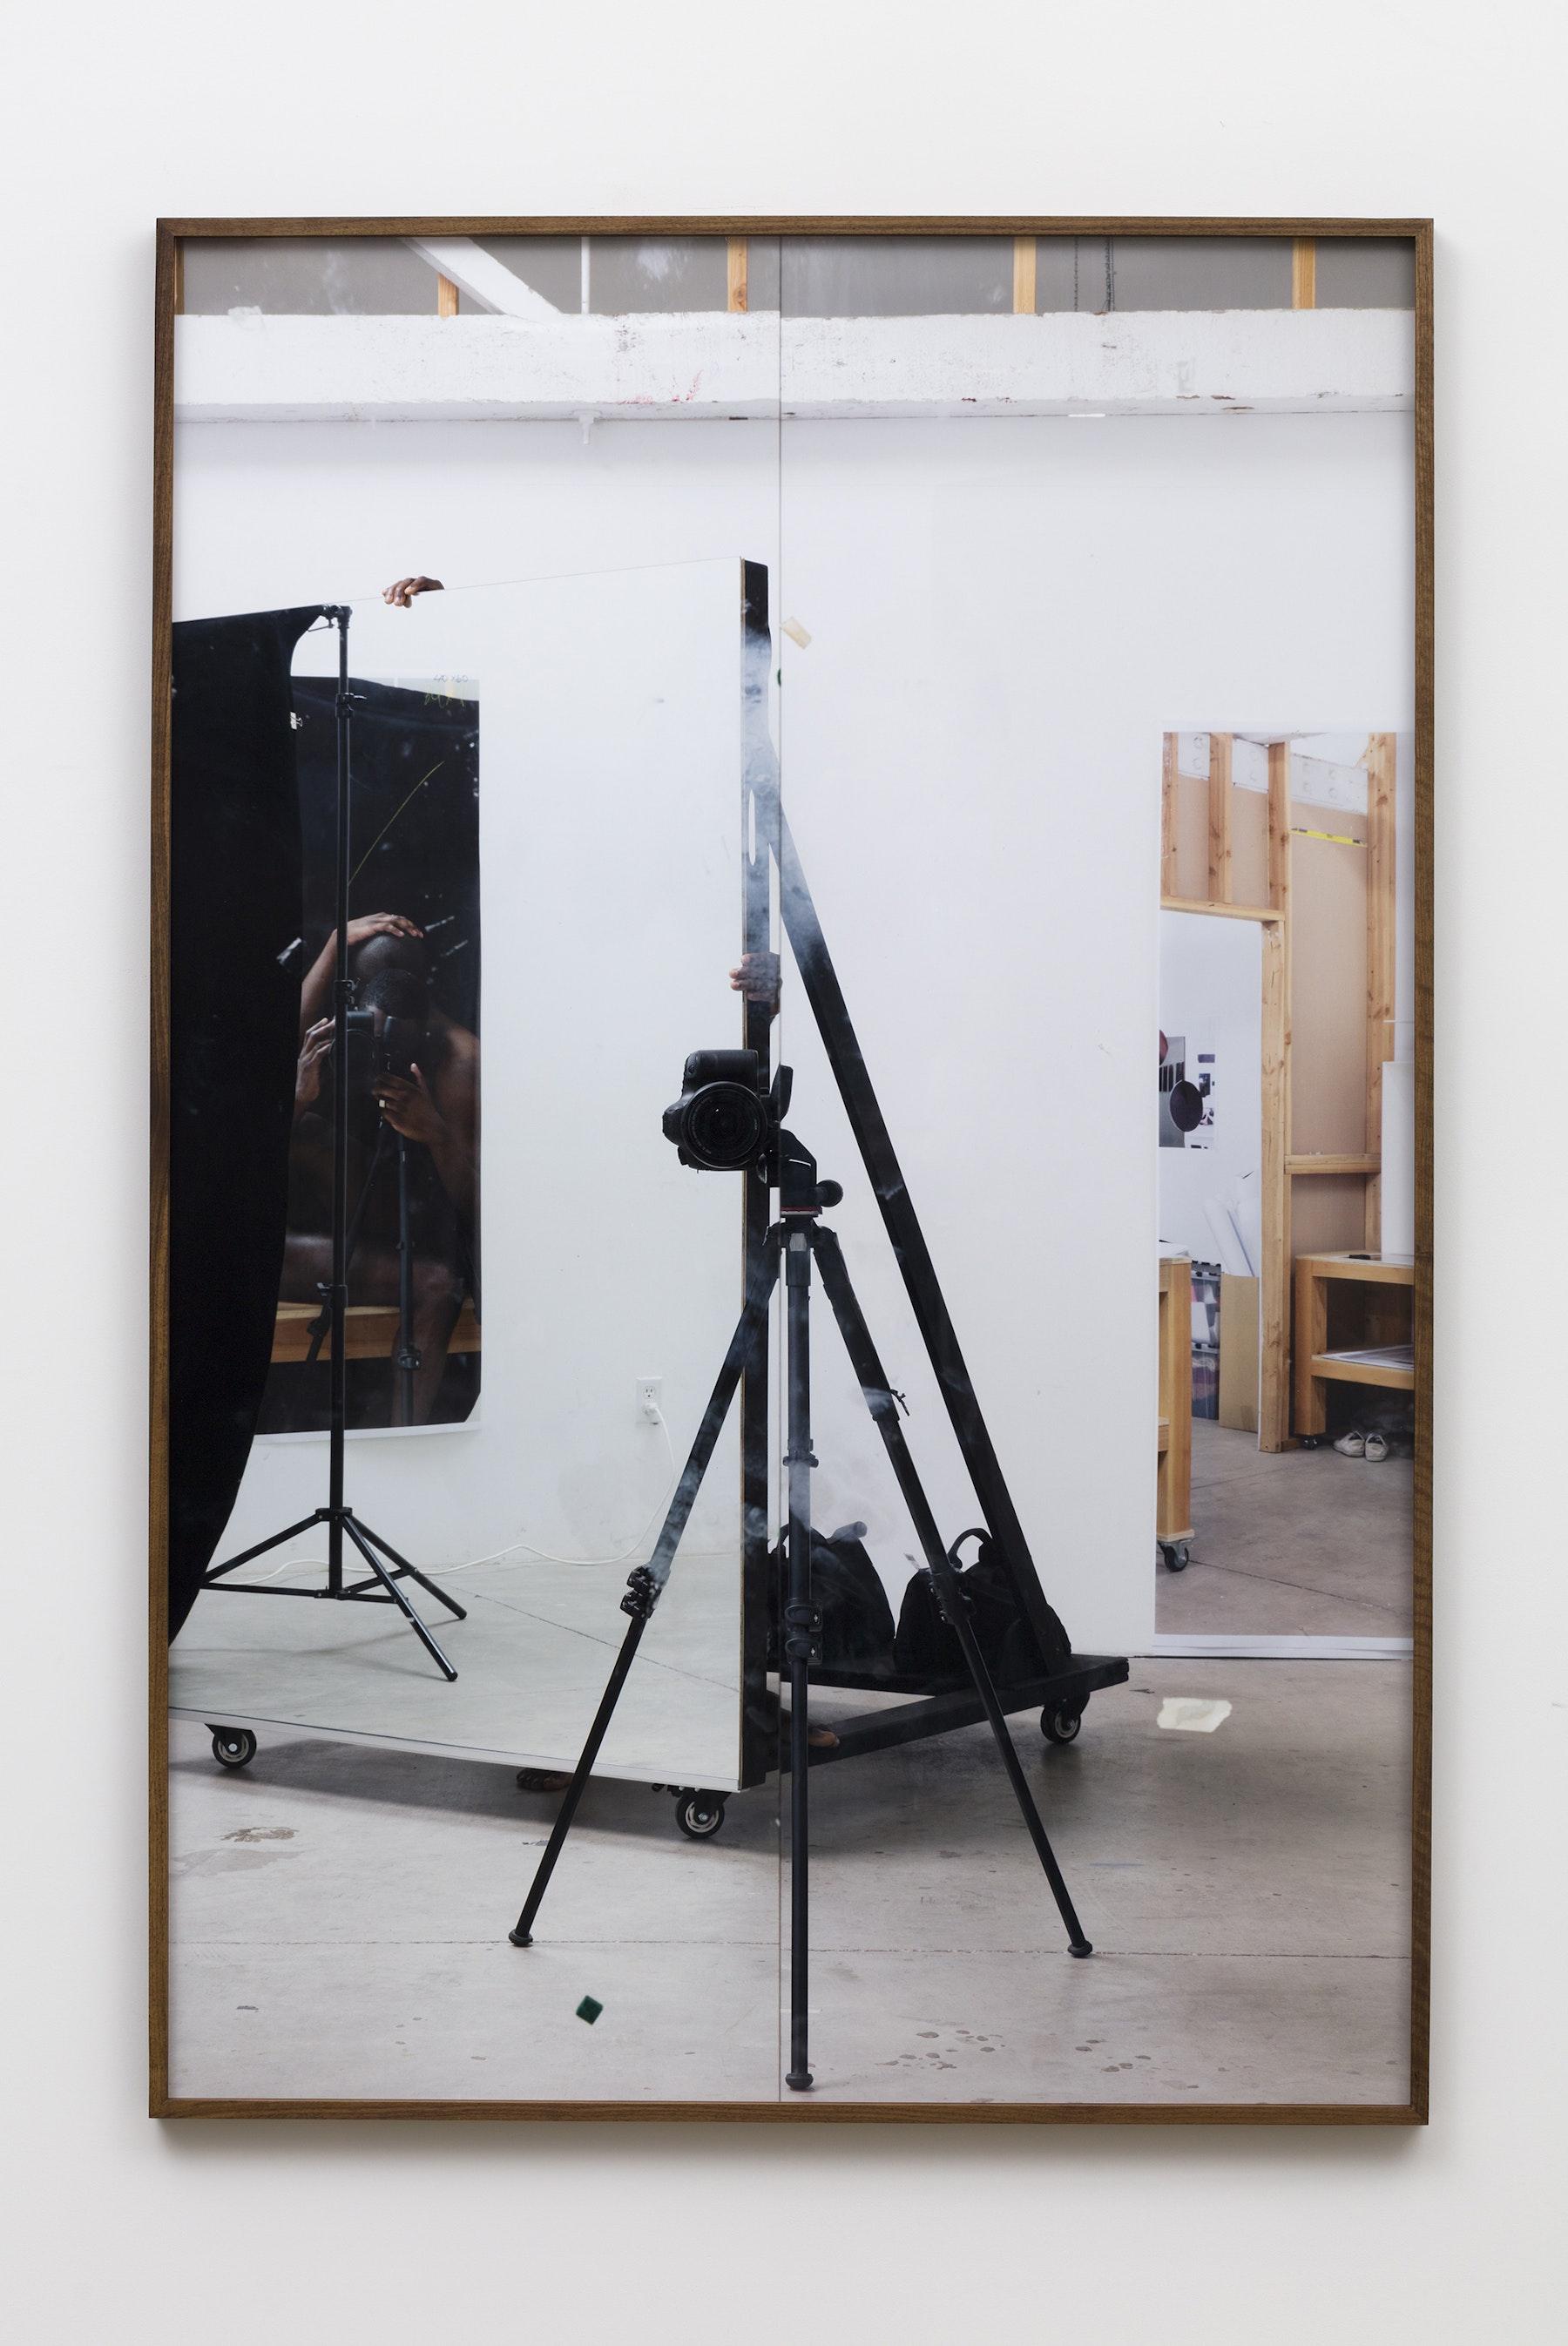 "Paul Mpagi Sepuya ""Studio (0X5A5051),"" 2020 Archival pigment print 75 x 50"" [HxW] (190.5 x 127 cm) Edition of 5, 2 AP Inventory #SEP665 Courtesy of the artist and Vielmetter Los Angeles Photo credit: Jeff McLane"